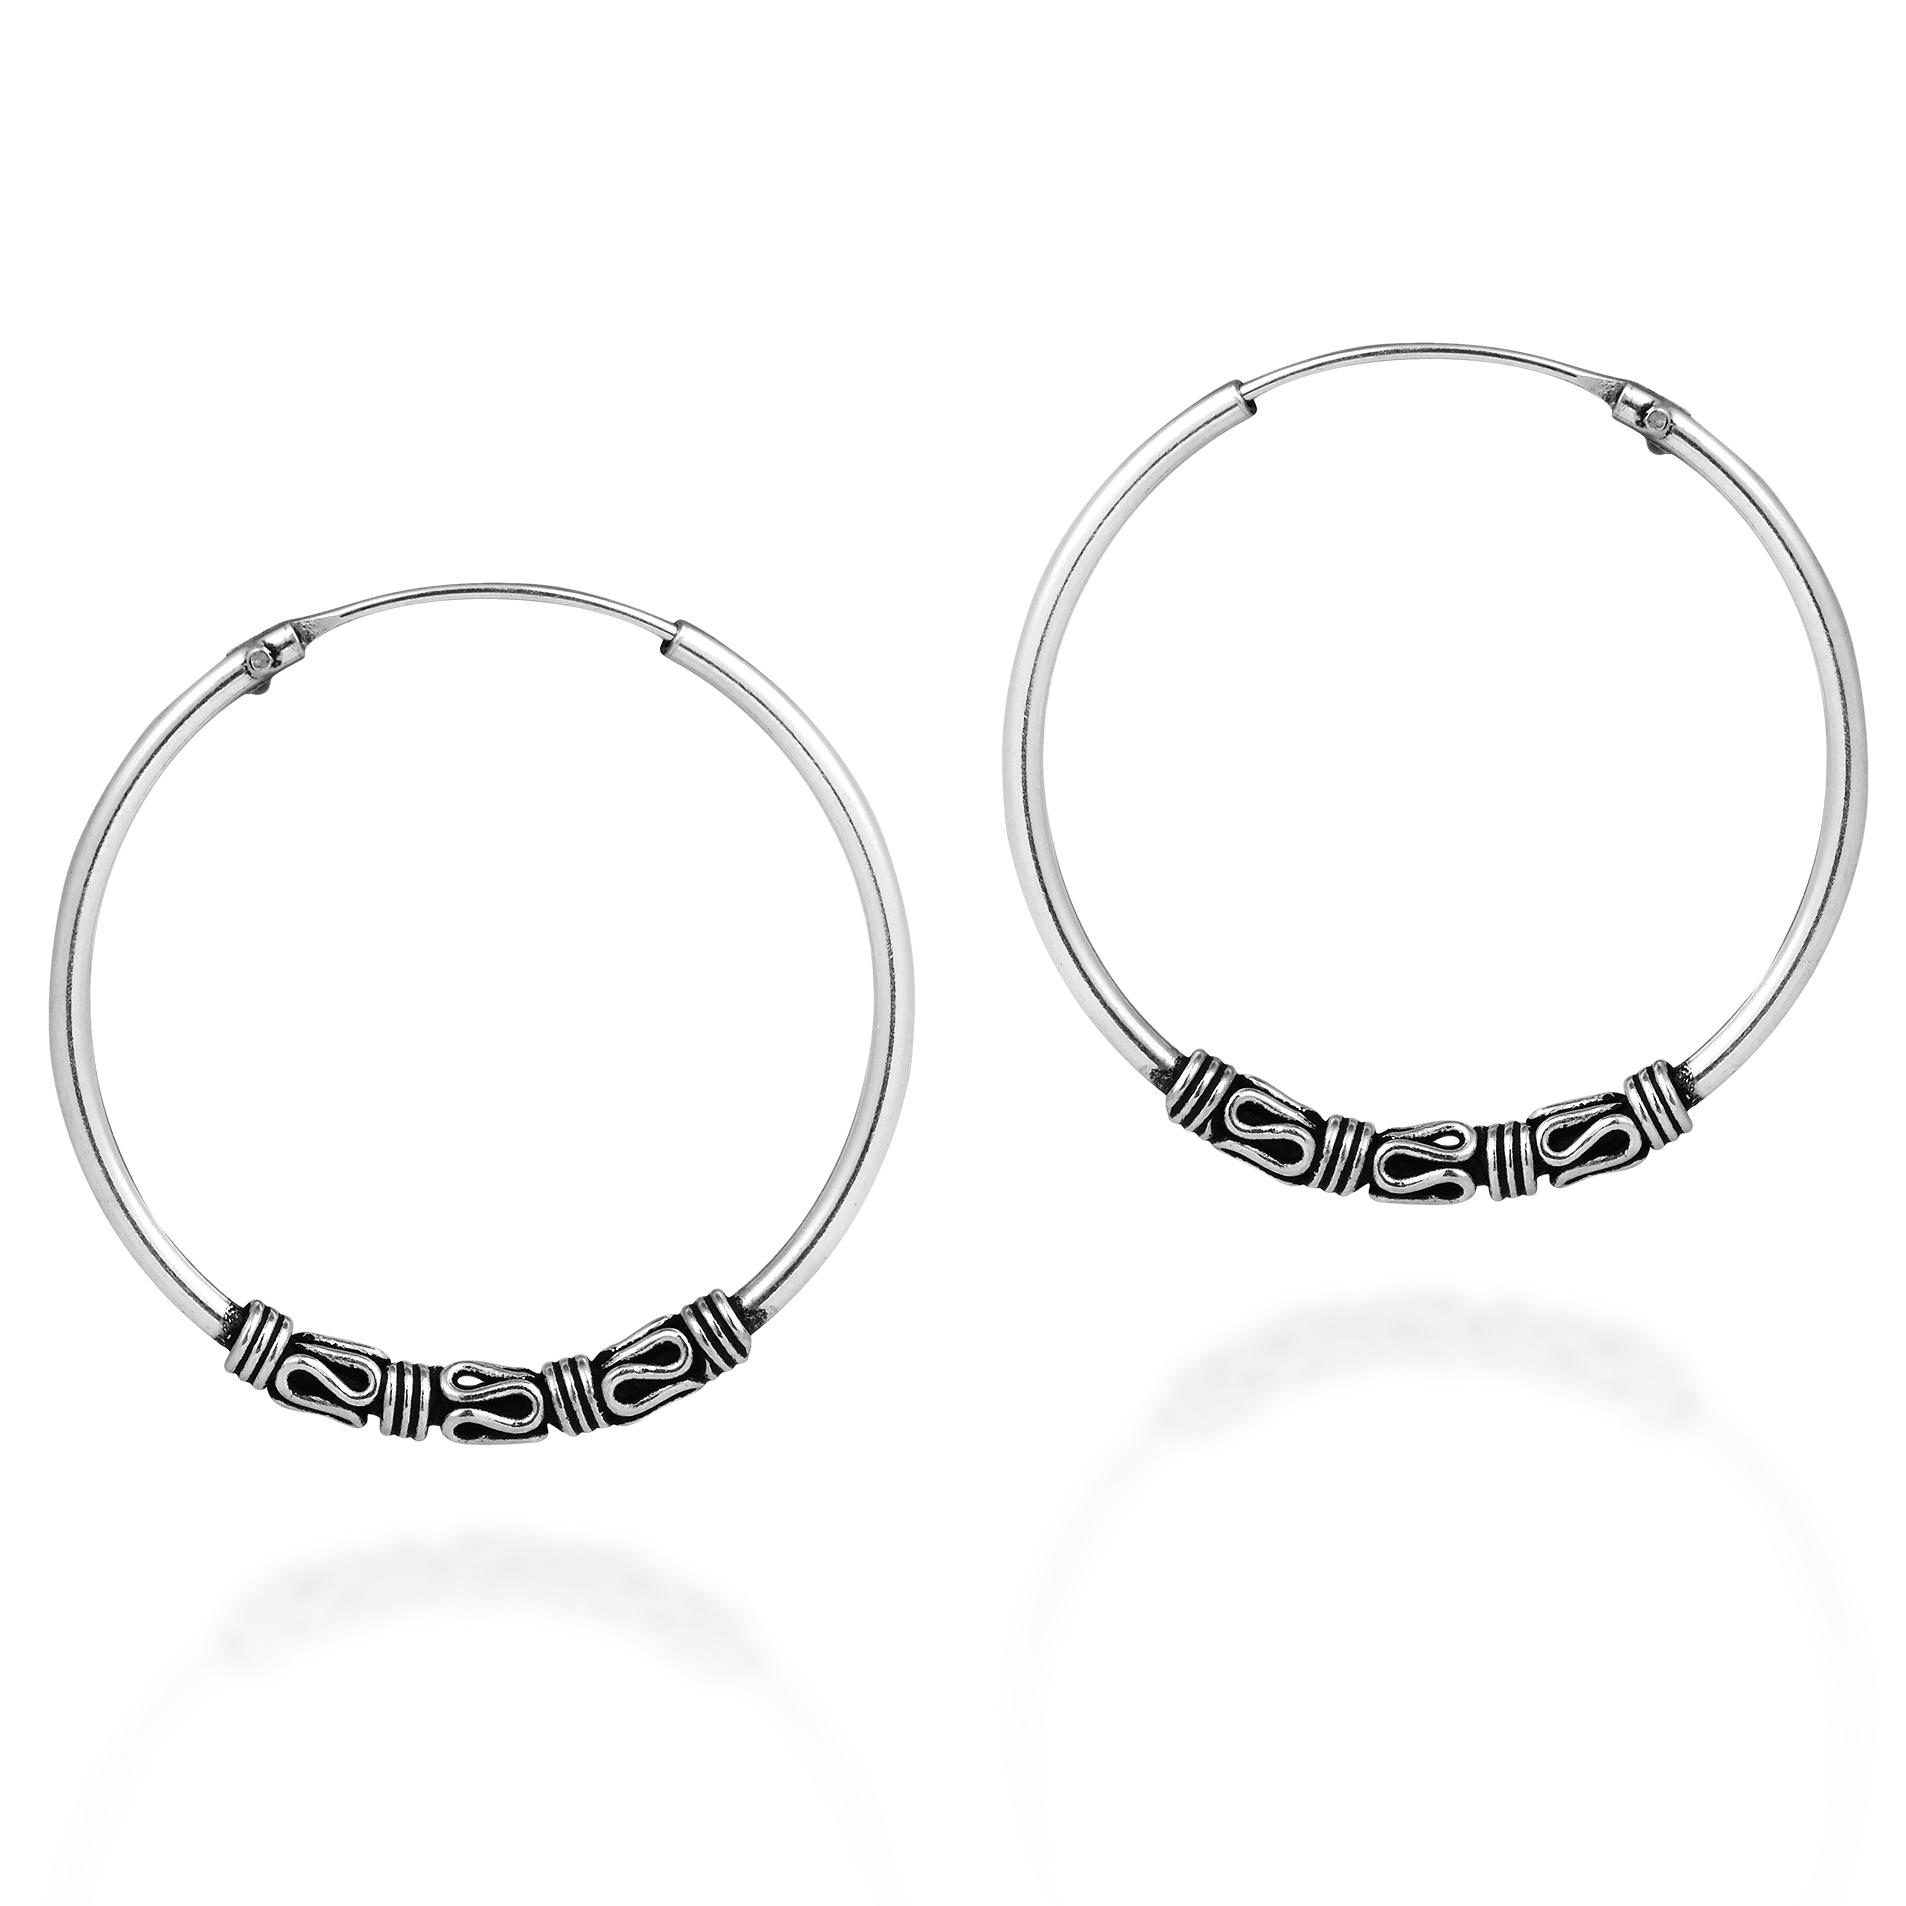 0f96b1630 Details about Interlace Tribal Cluster Bali Sterling Silver 30mm Hoop  Earrings